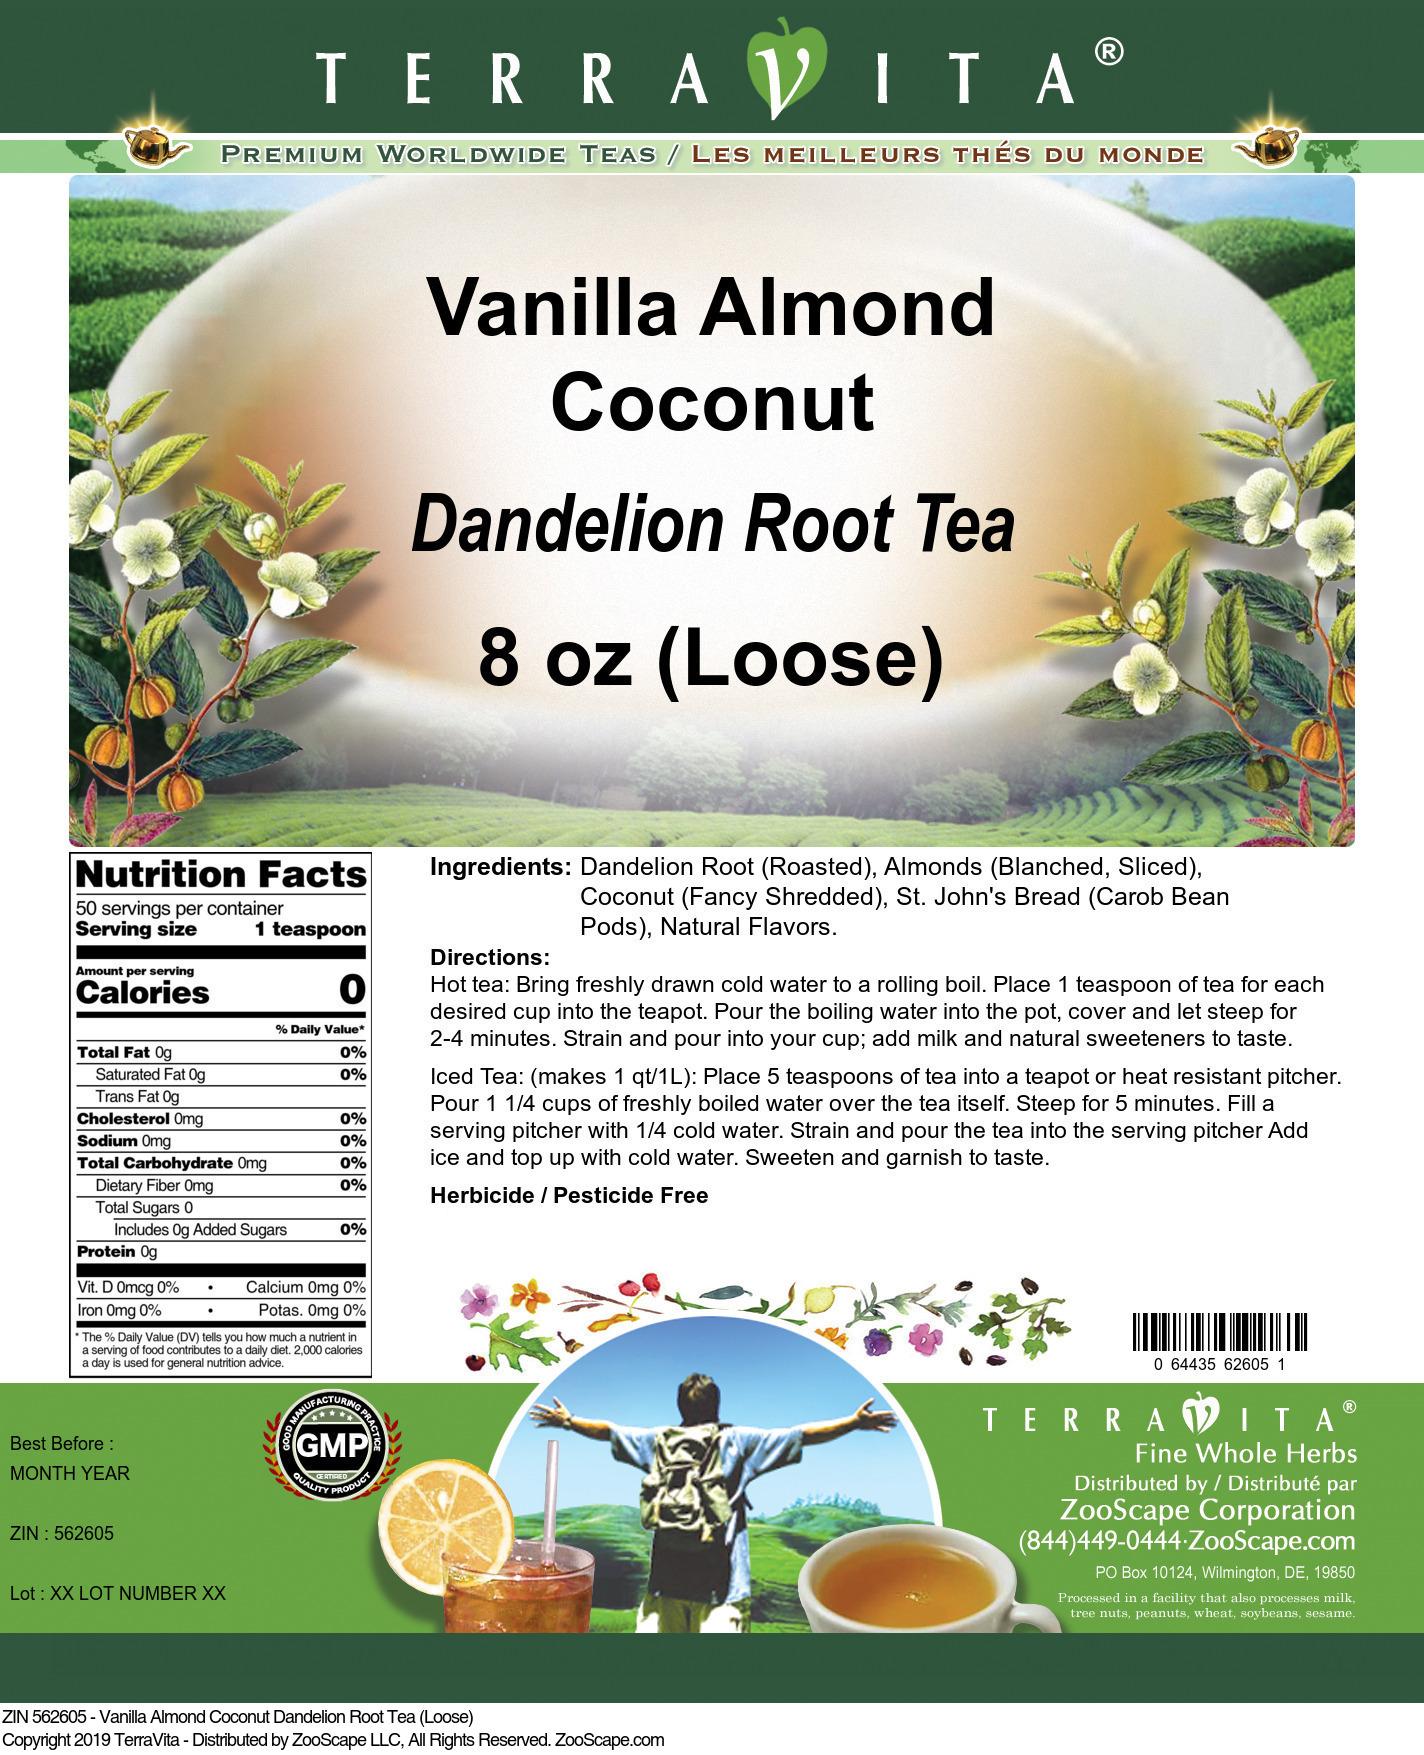 Vanilla Almond Coconut Dandelion Root Tea (Loose)